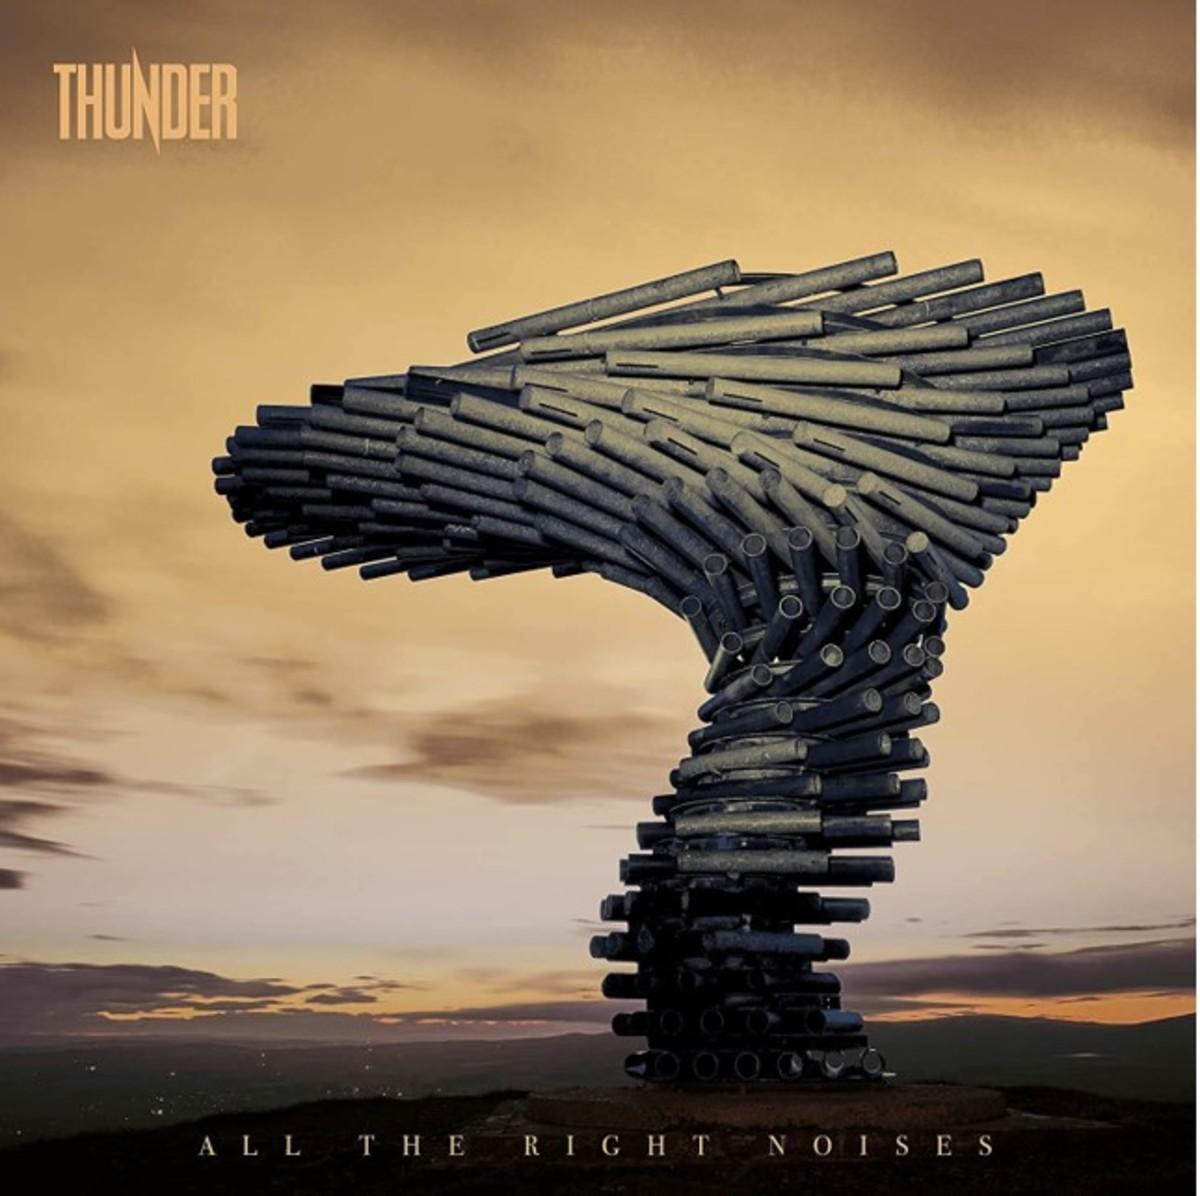 Thunder main